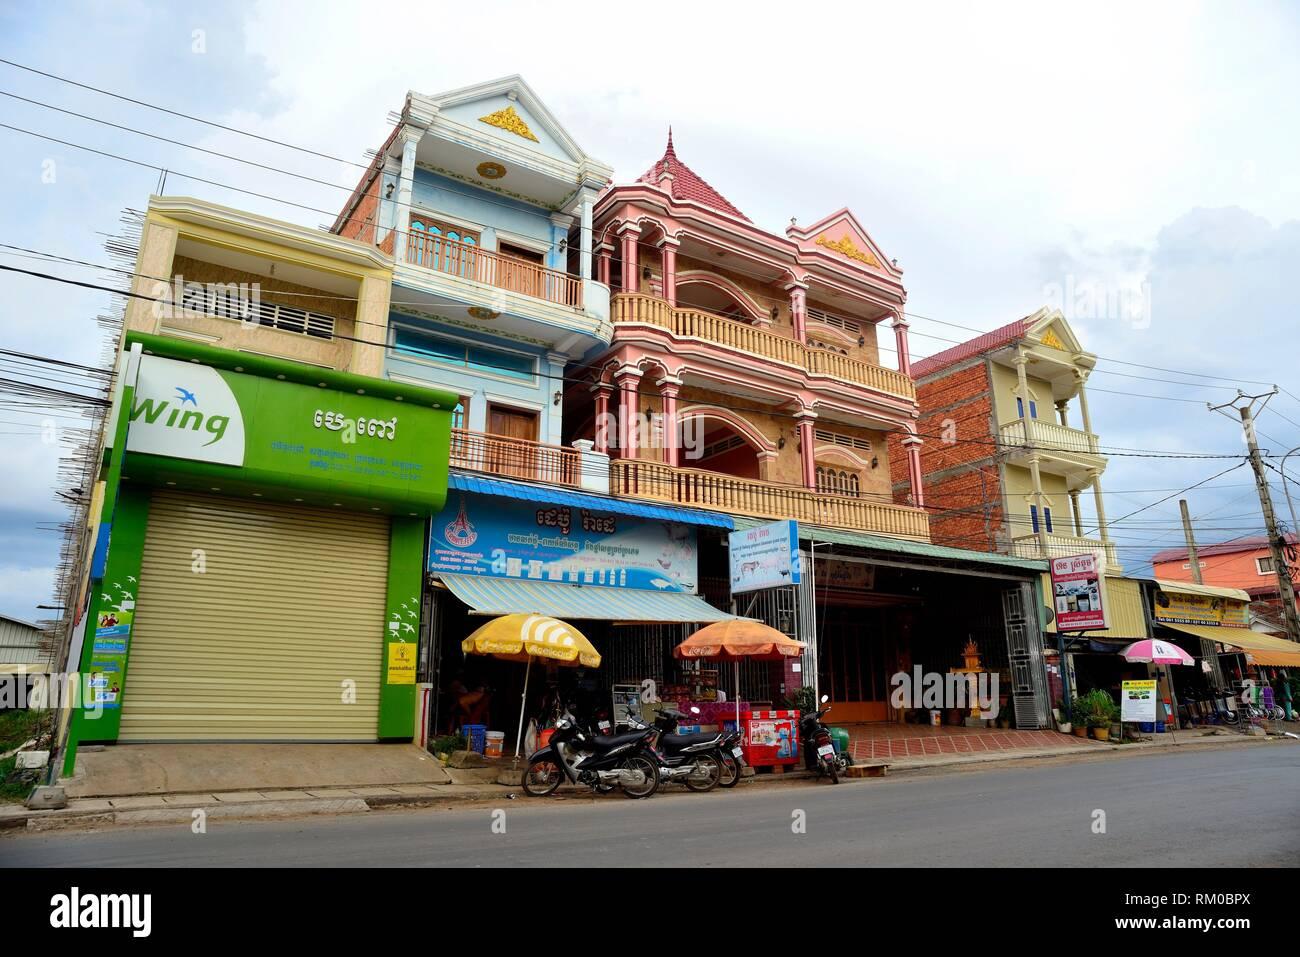 Facades in Sihanouk street, Kratie, Cambodia. Stock Photo